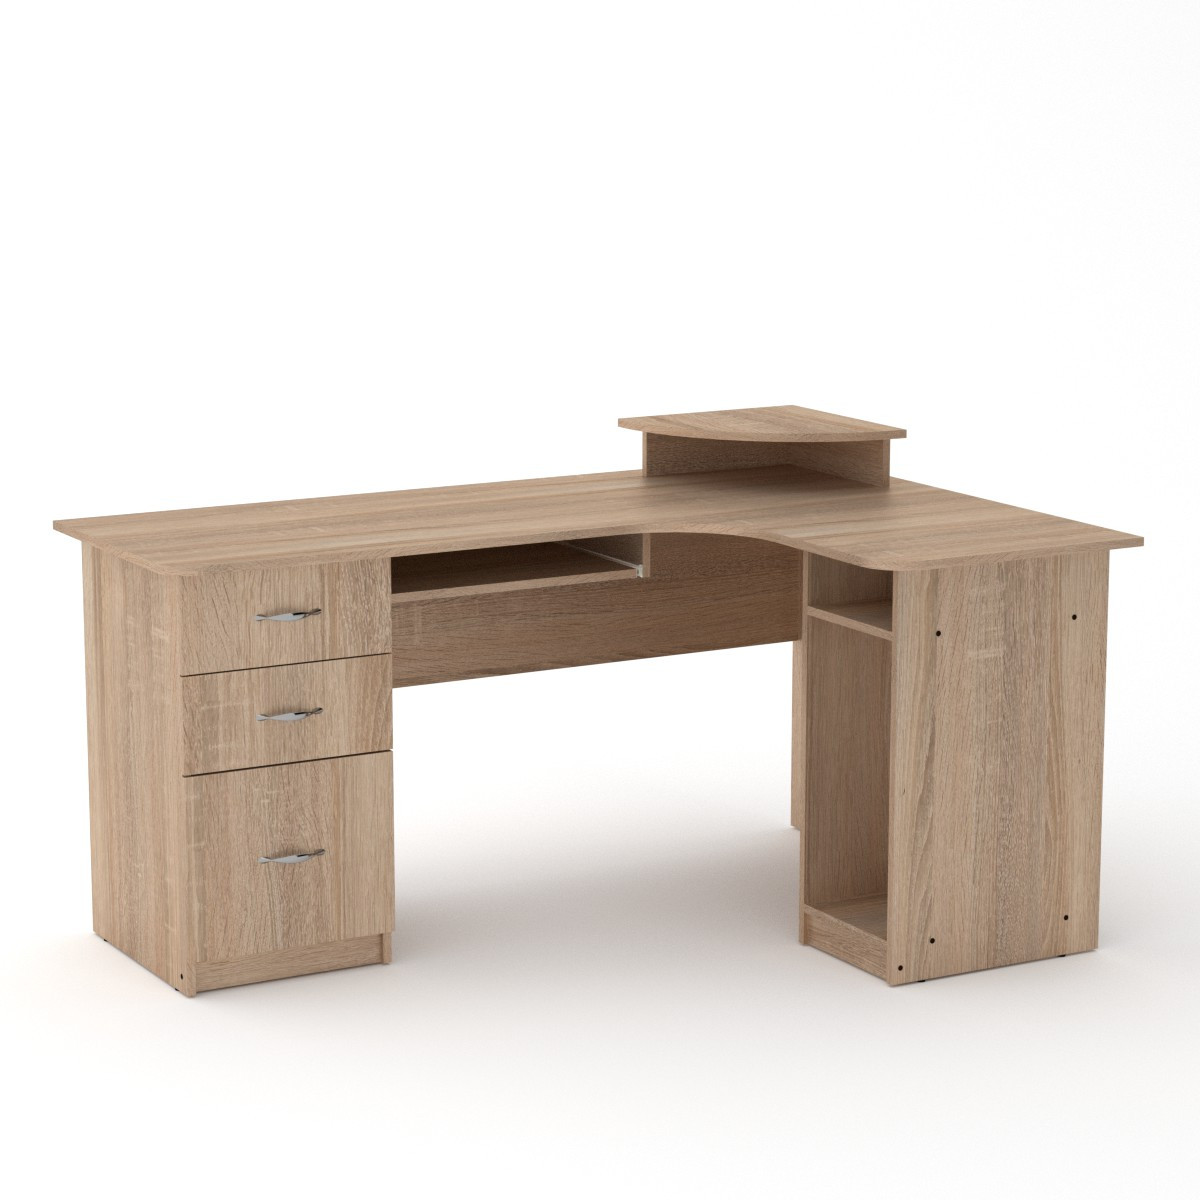 Стол компьютерный СУ-3 дуб сонома Компанит (160х110х87 см)